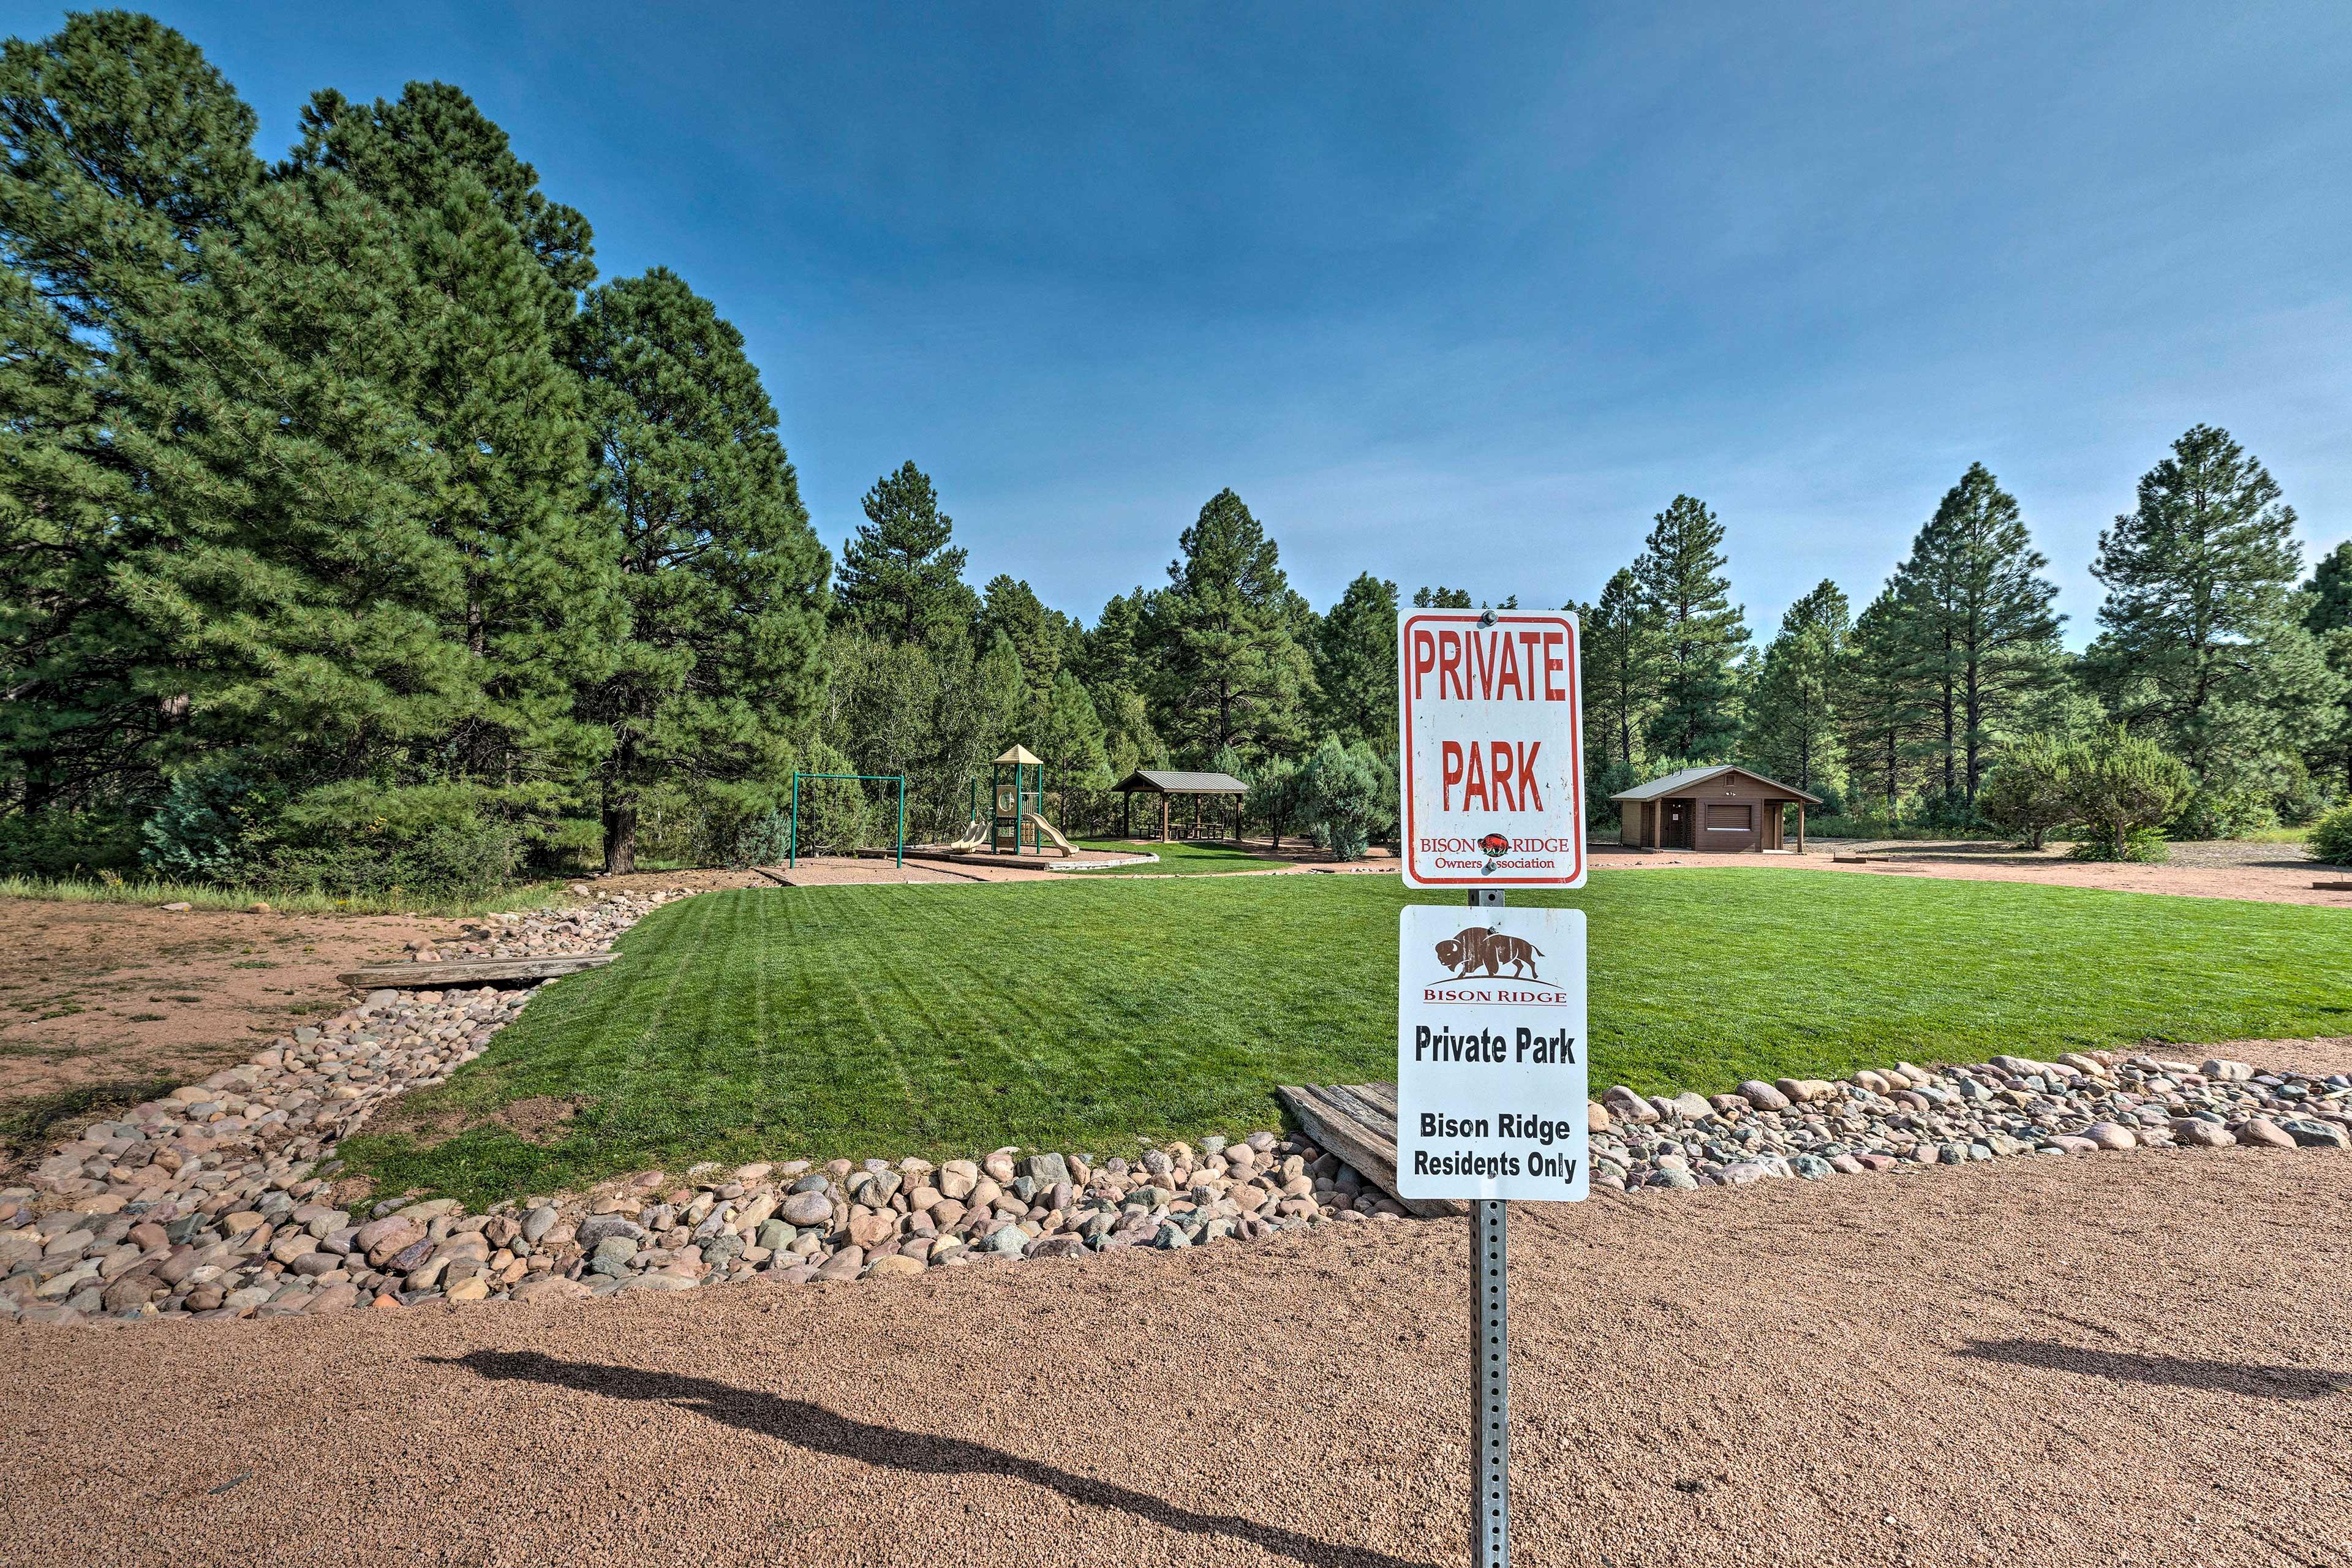 Enjoy the family-friendly park at Bison Ridge!